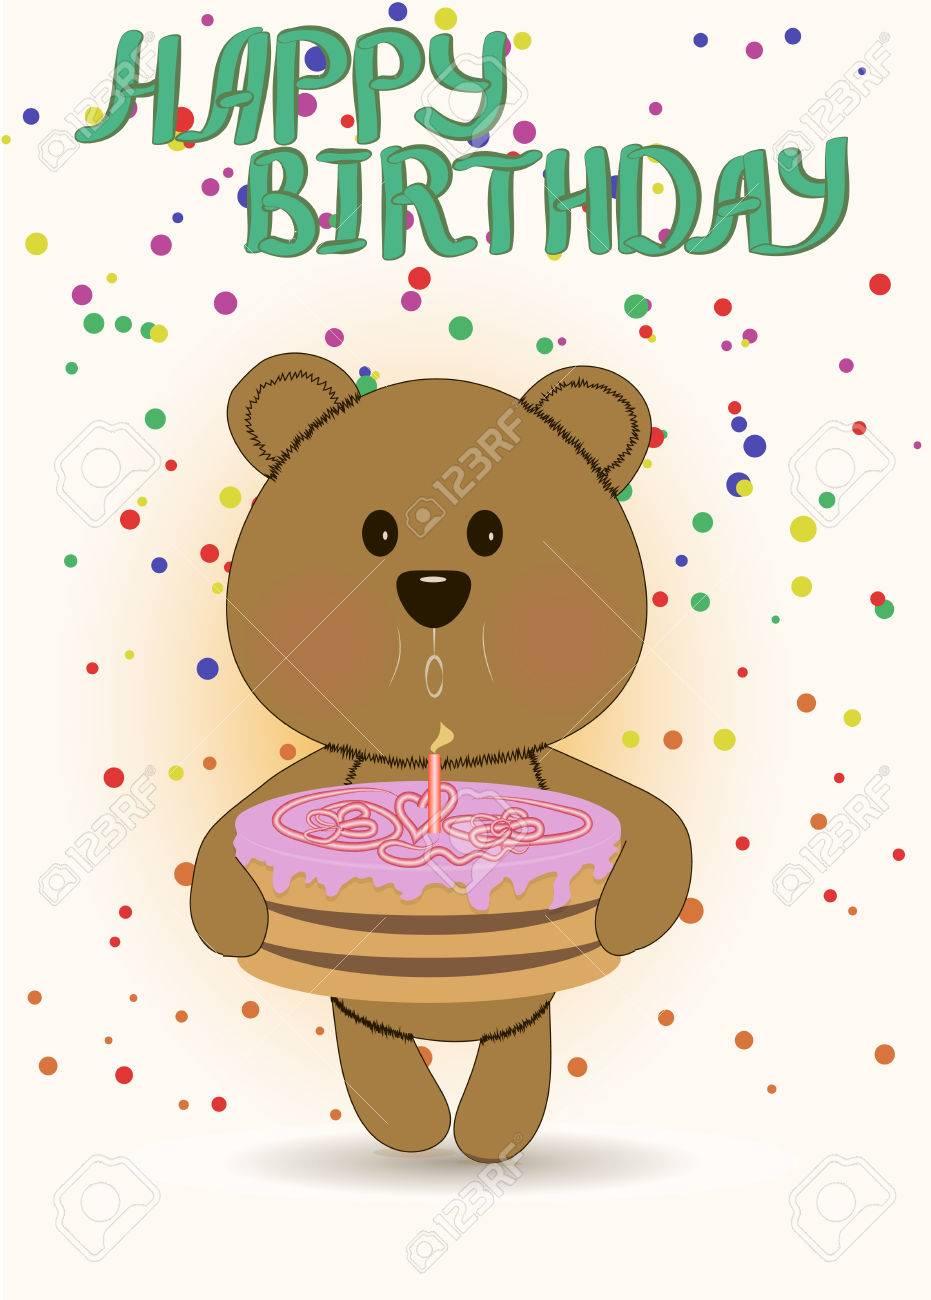 Happy Birthday Card With Cute Teddy Bear Embracing Birthday Cake